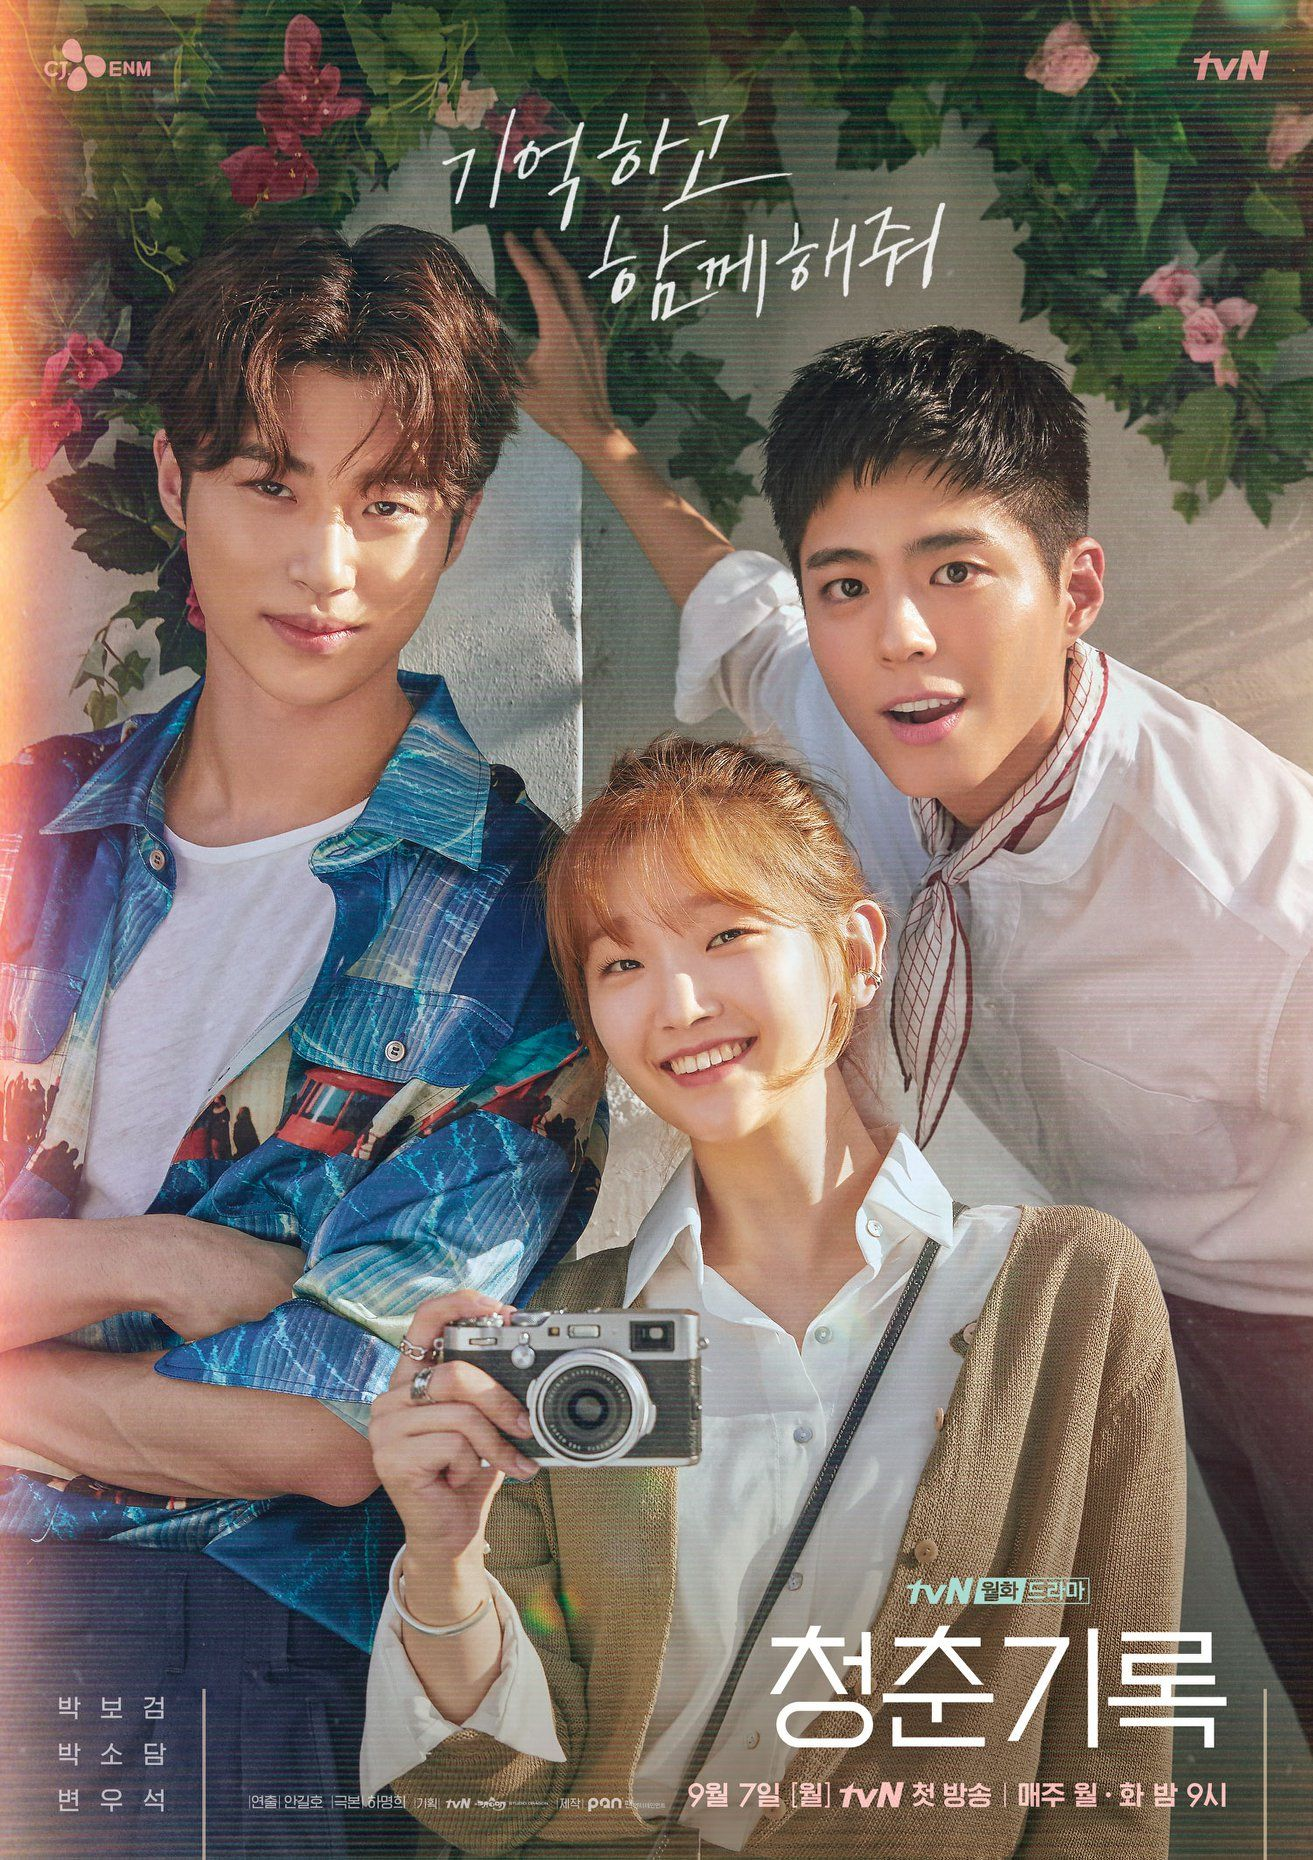 Park Seo Joon Tidak Minum Air Seharian, Untuk Memaksimalkan Proses Syuting 1